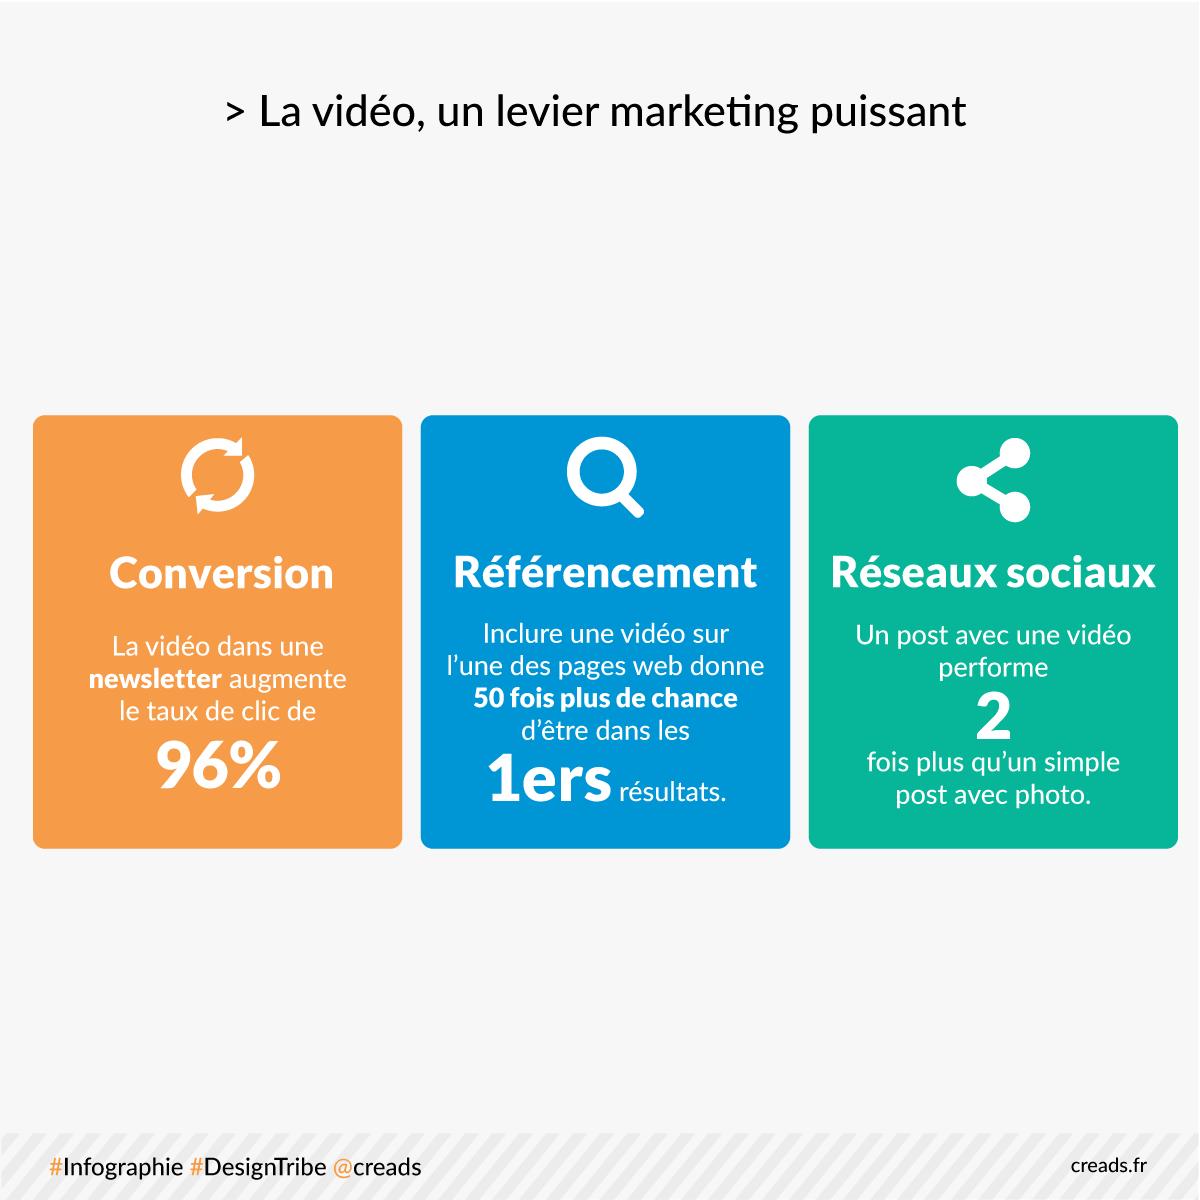 video-levier-marketing